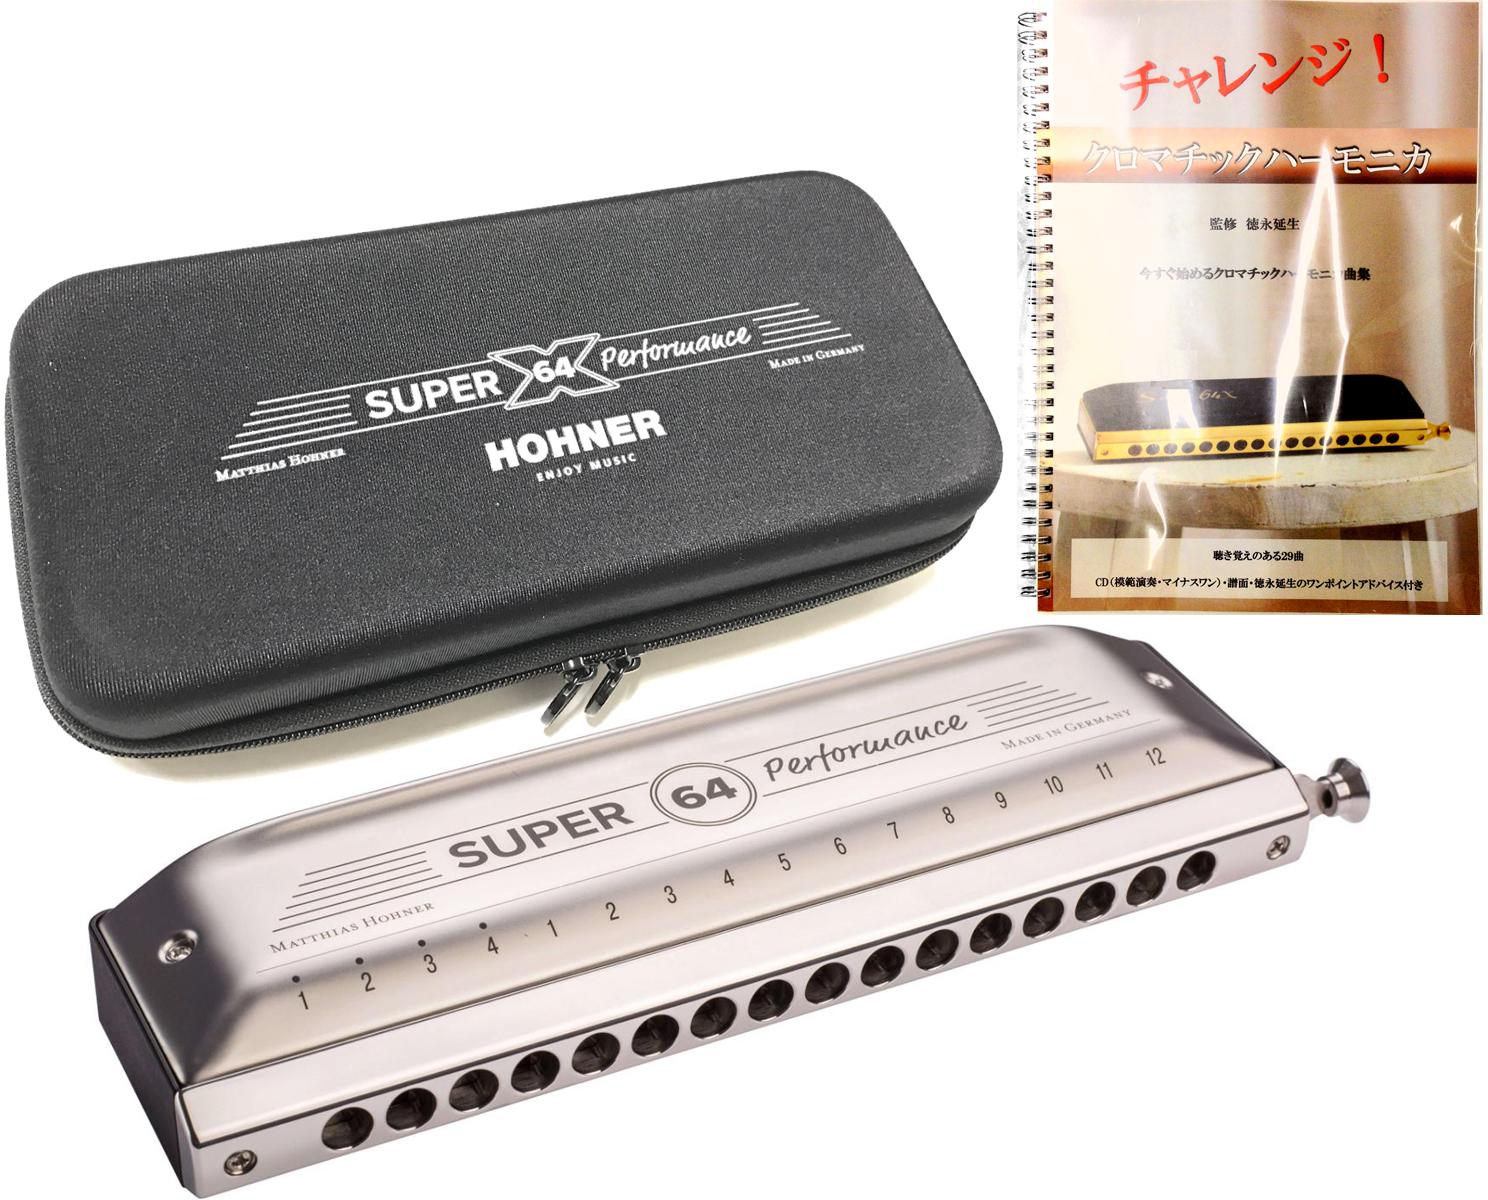 HOHNER ( ホーナー ) NEW SUPER 64 7582/64 クロマチックハーモニカ スライド式 4オクターブ 16穴 樹脂ボディ ハーモニカ 【 Super-64 徳永延生 曲集 セット 】 送料無料